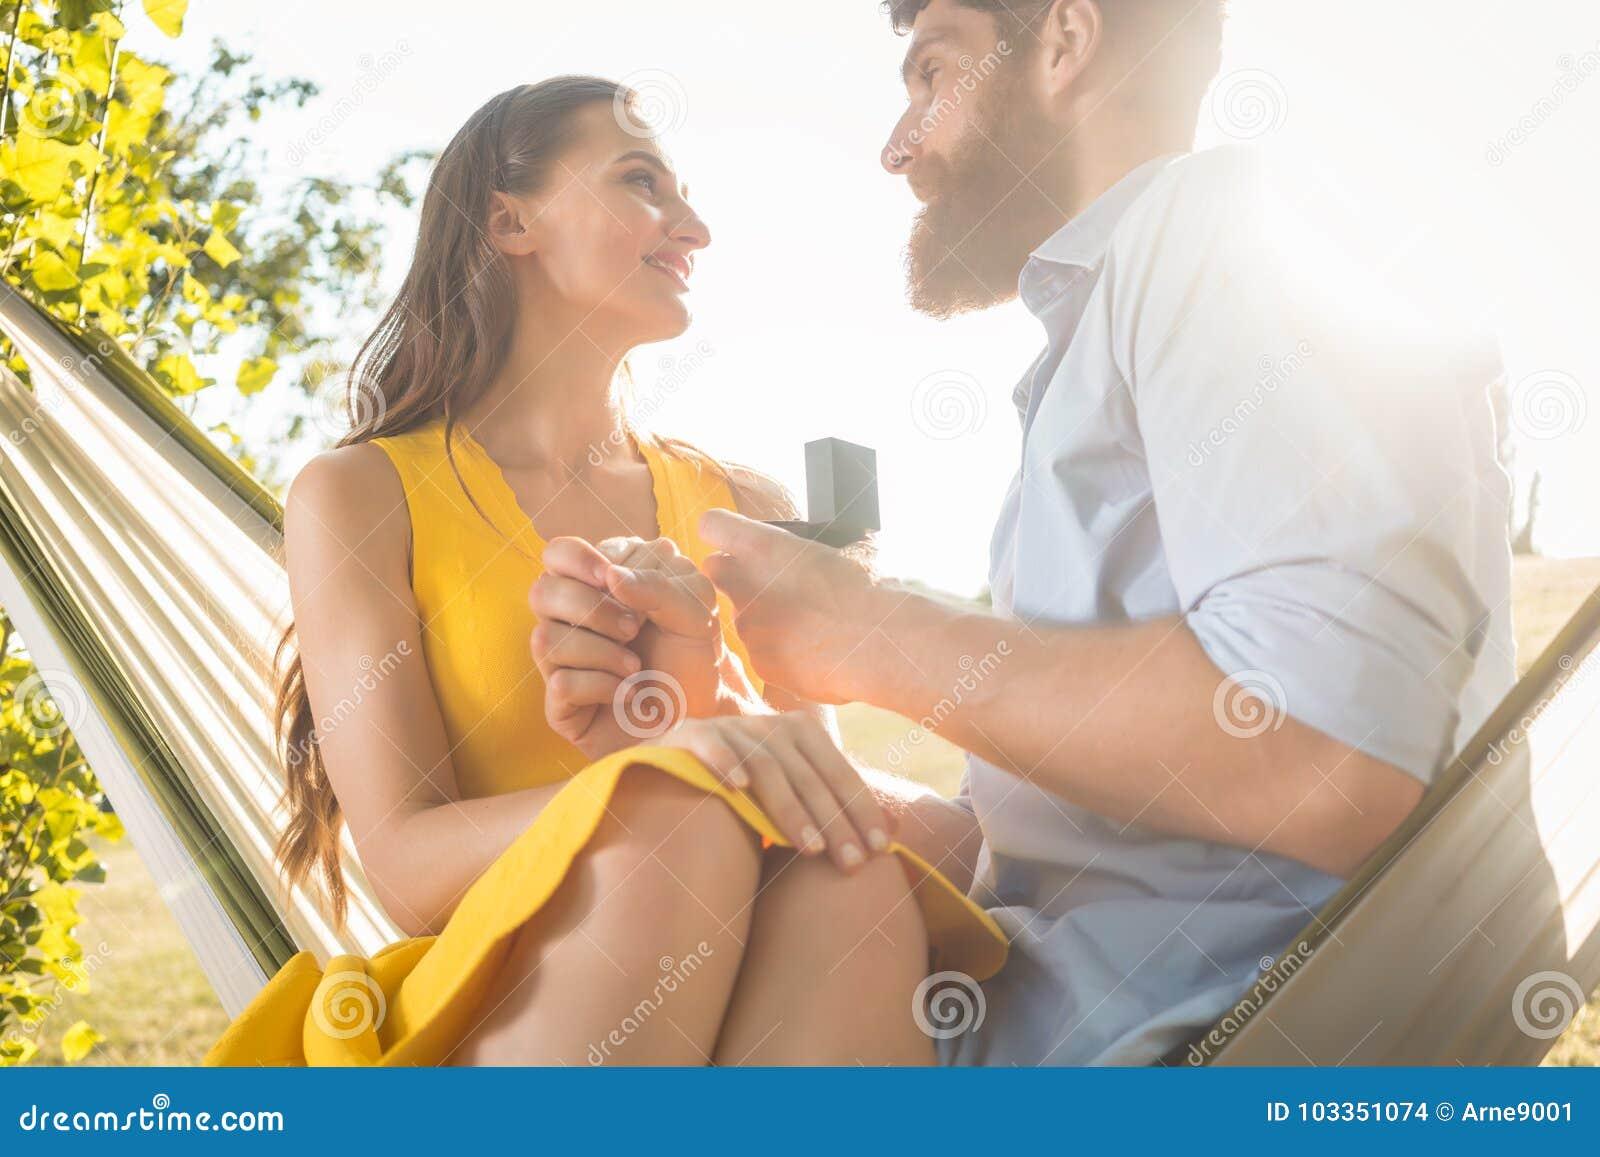 Young man making marriage proposal to beautiful girlfriend while